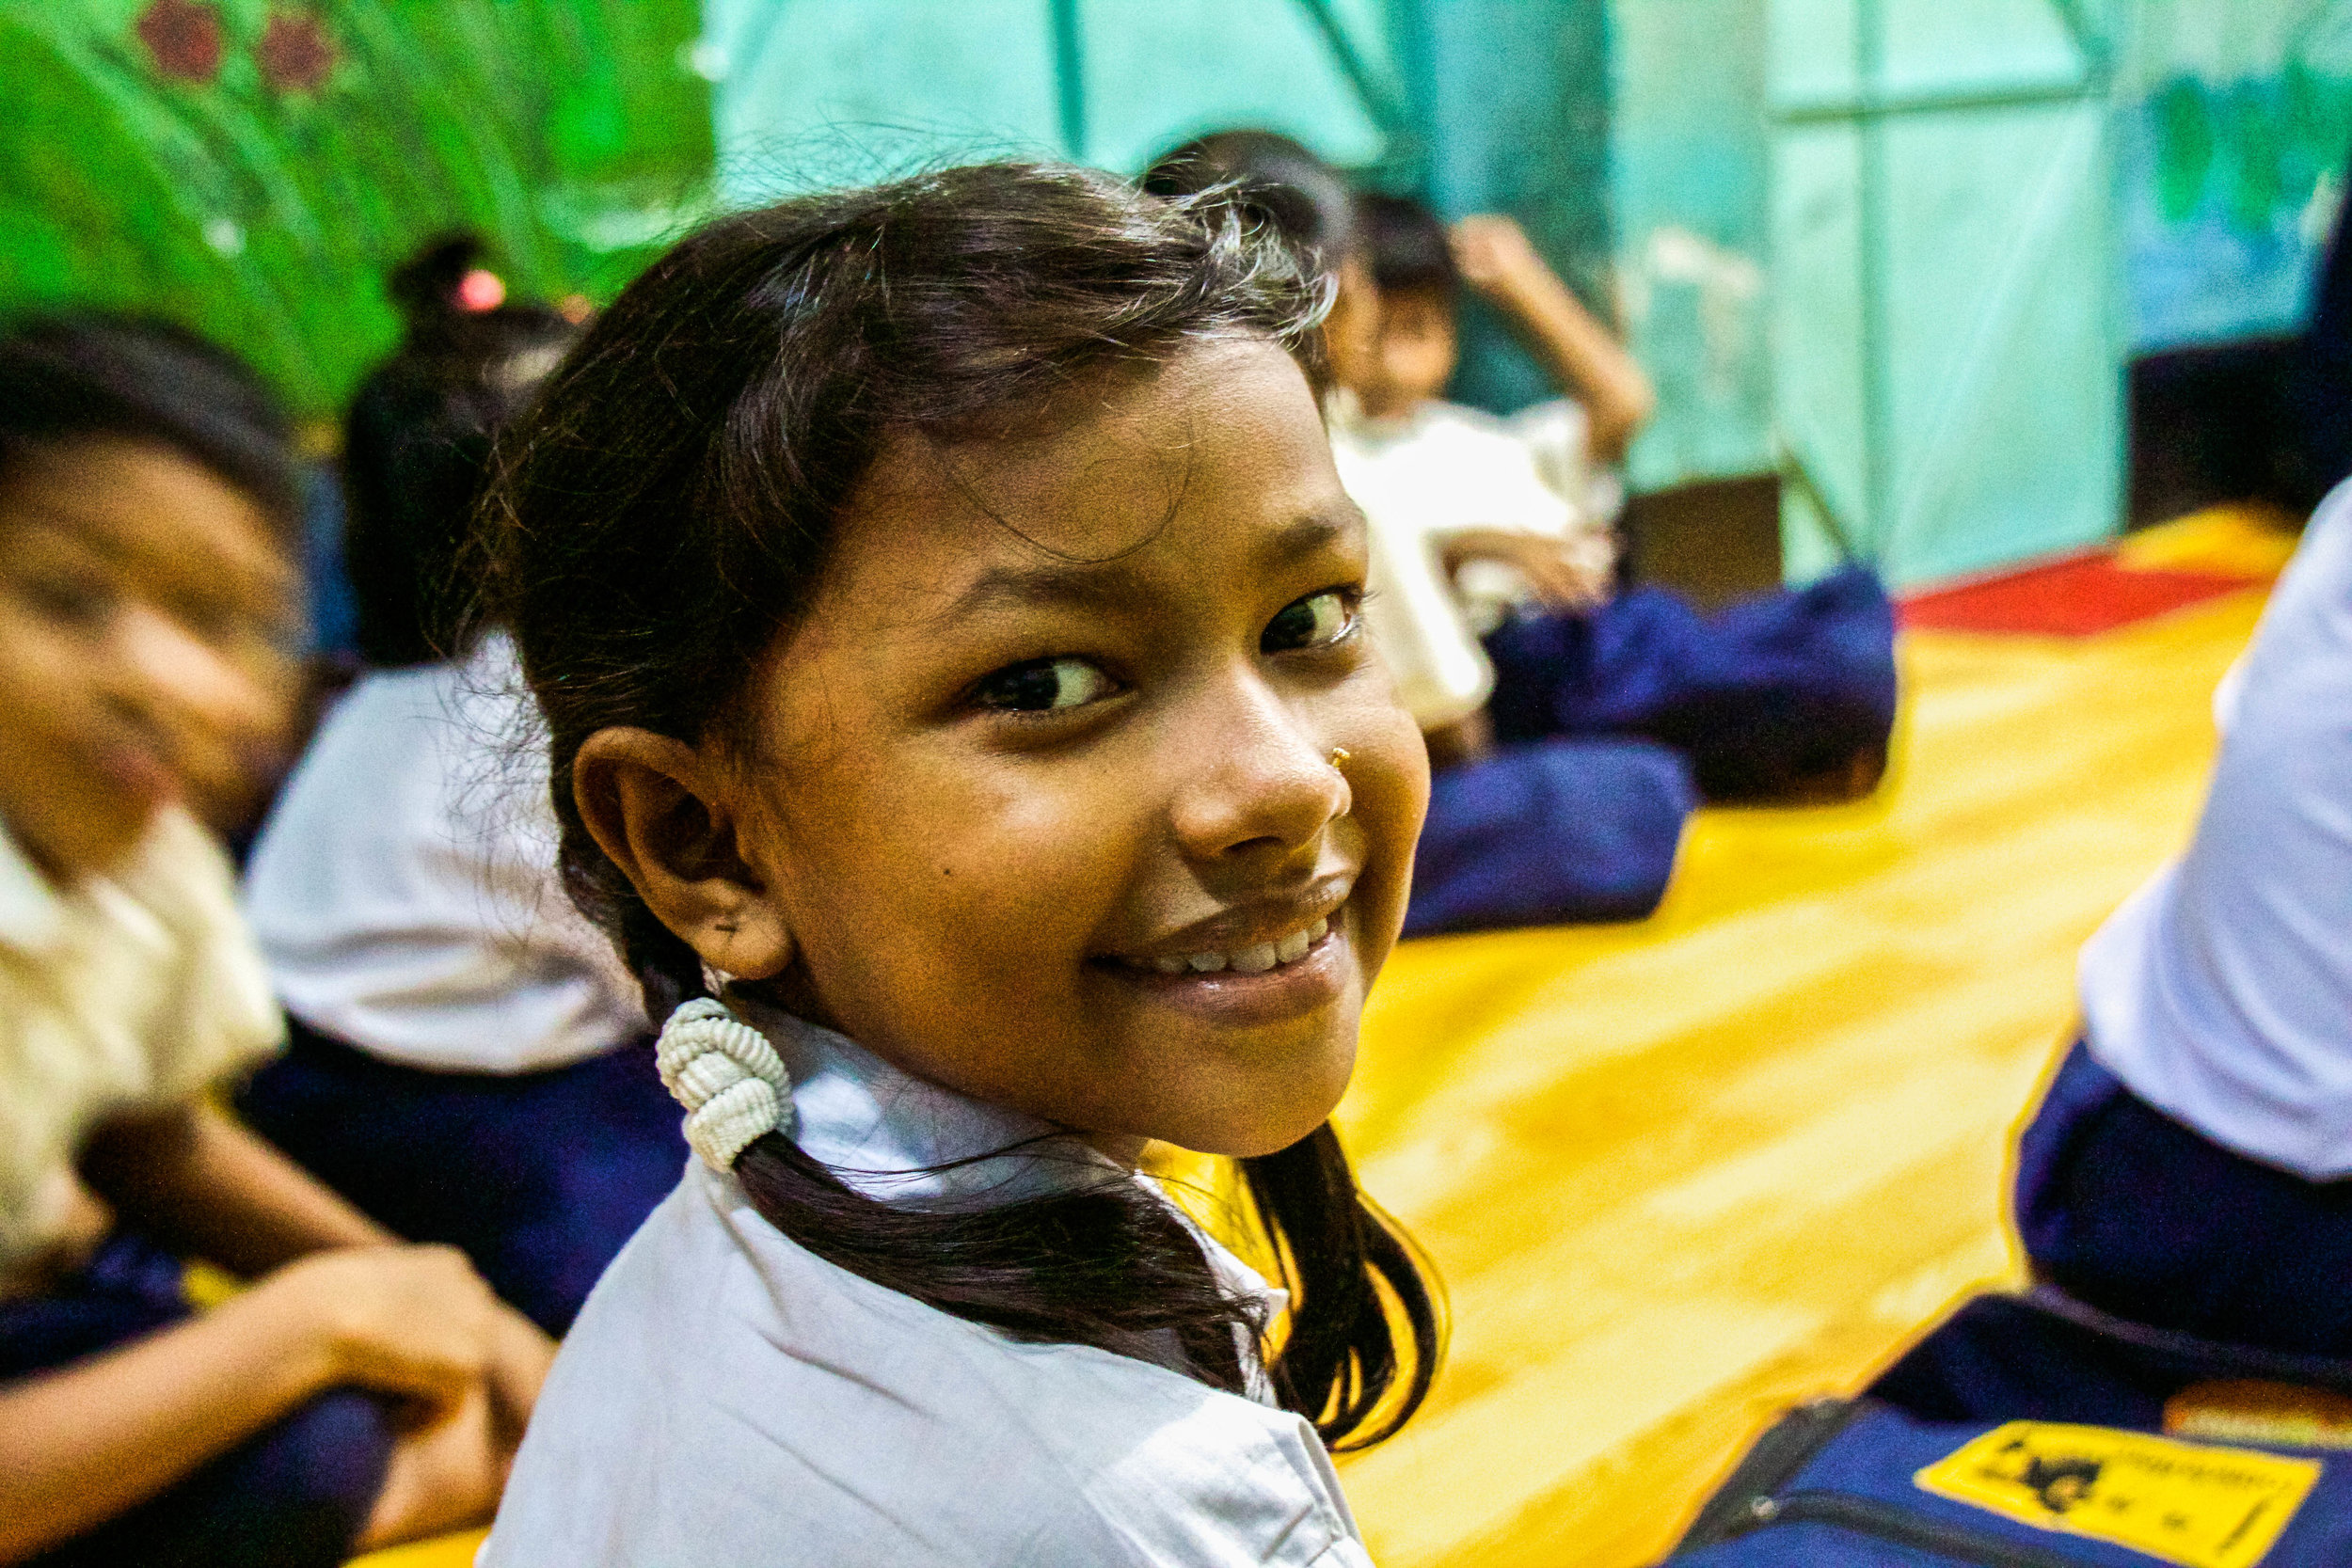 dhaka bangladesh jaago school children-40-20.jpg